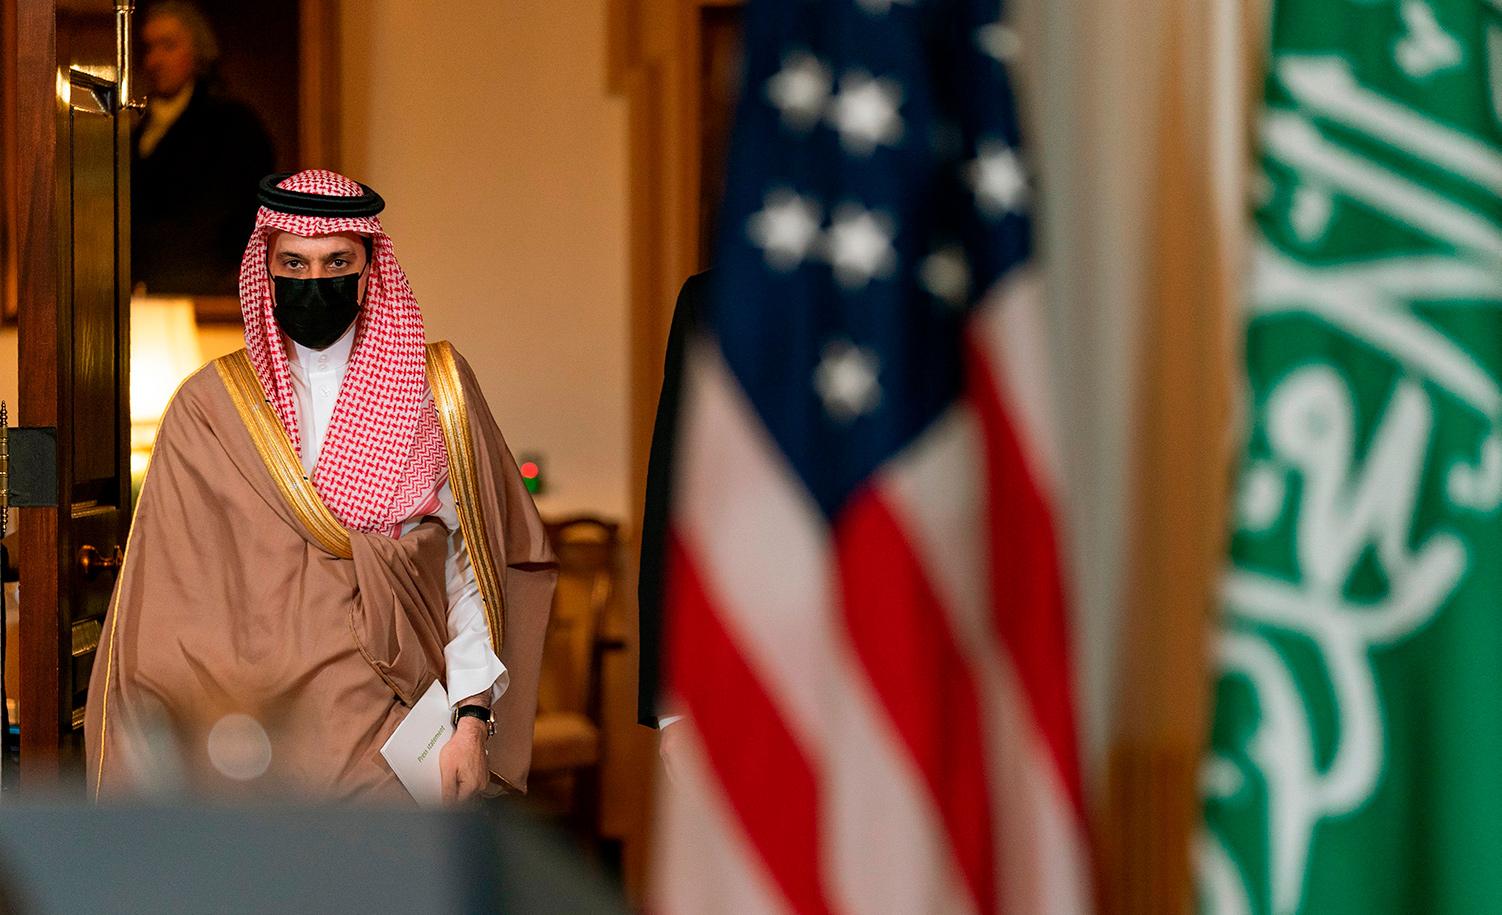 Saudi Minister of Foreign Affairs Prince Faisal bin Farhan al-Saud at the State Department in Washington, D.C. on October 14, 2020. MANUEL BALCE CENETA/POOL/AFP via Getty Images.